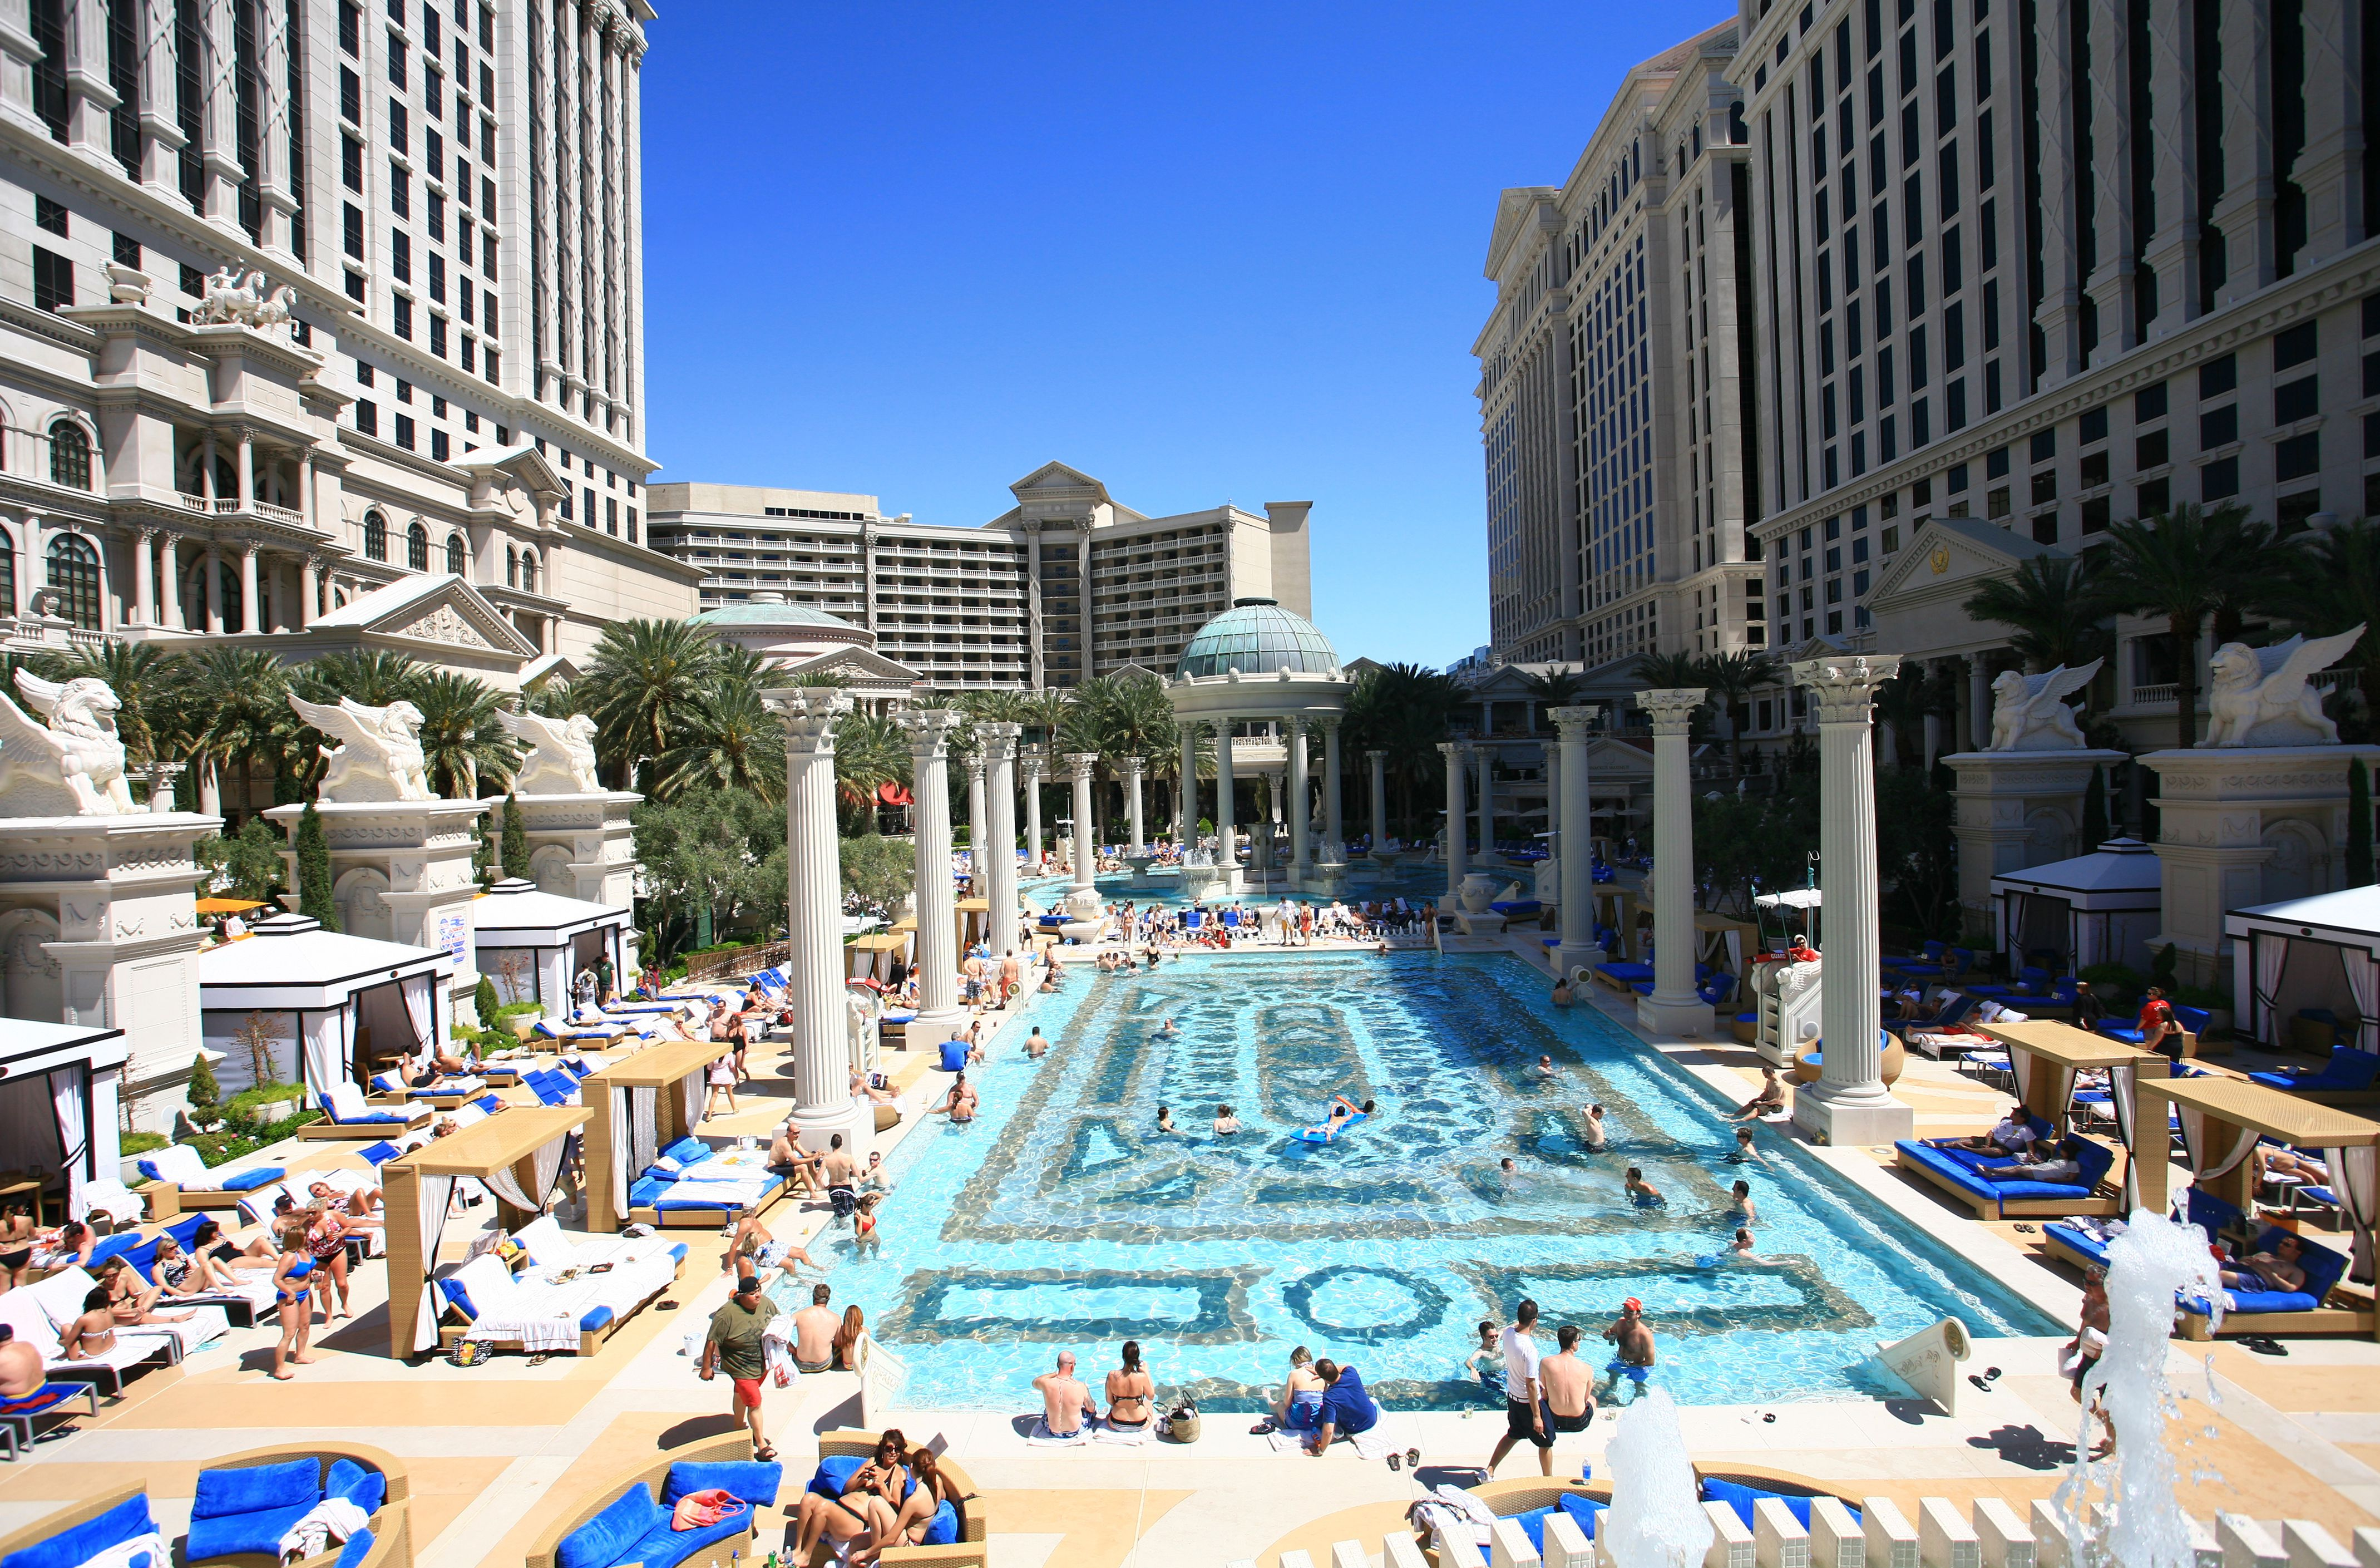 Las Vegas Pool Party at Caesar's Palace